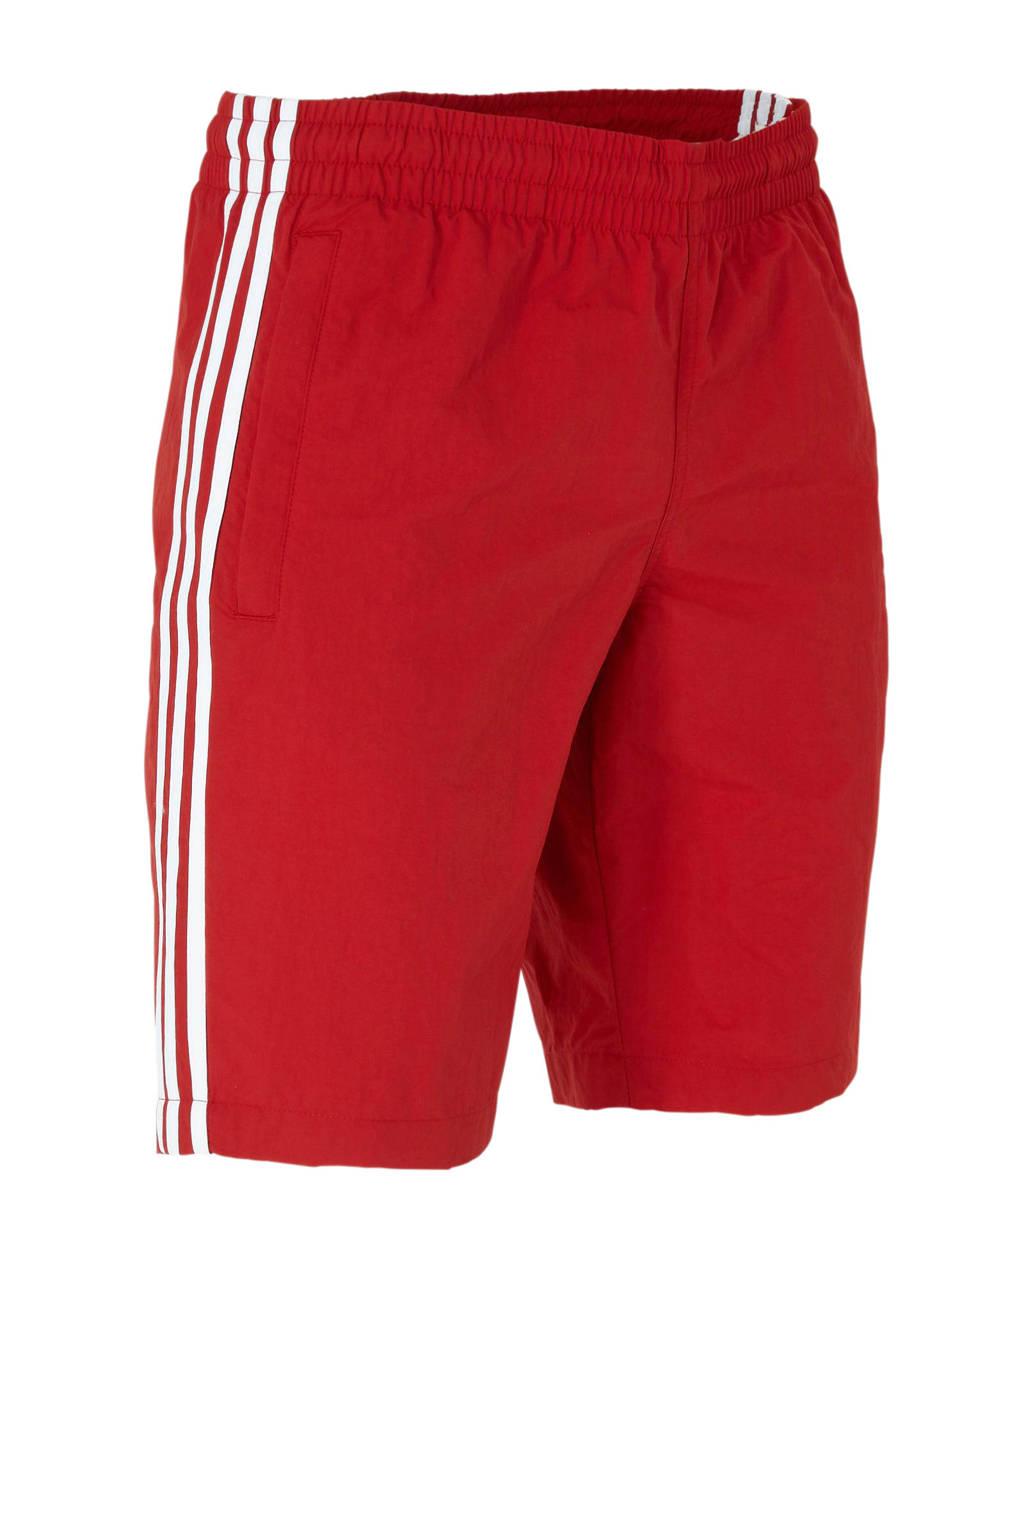 adidas originals zwemshort rood, Rood